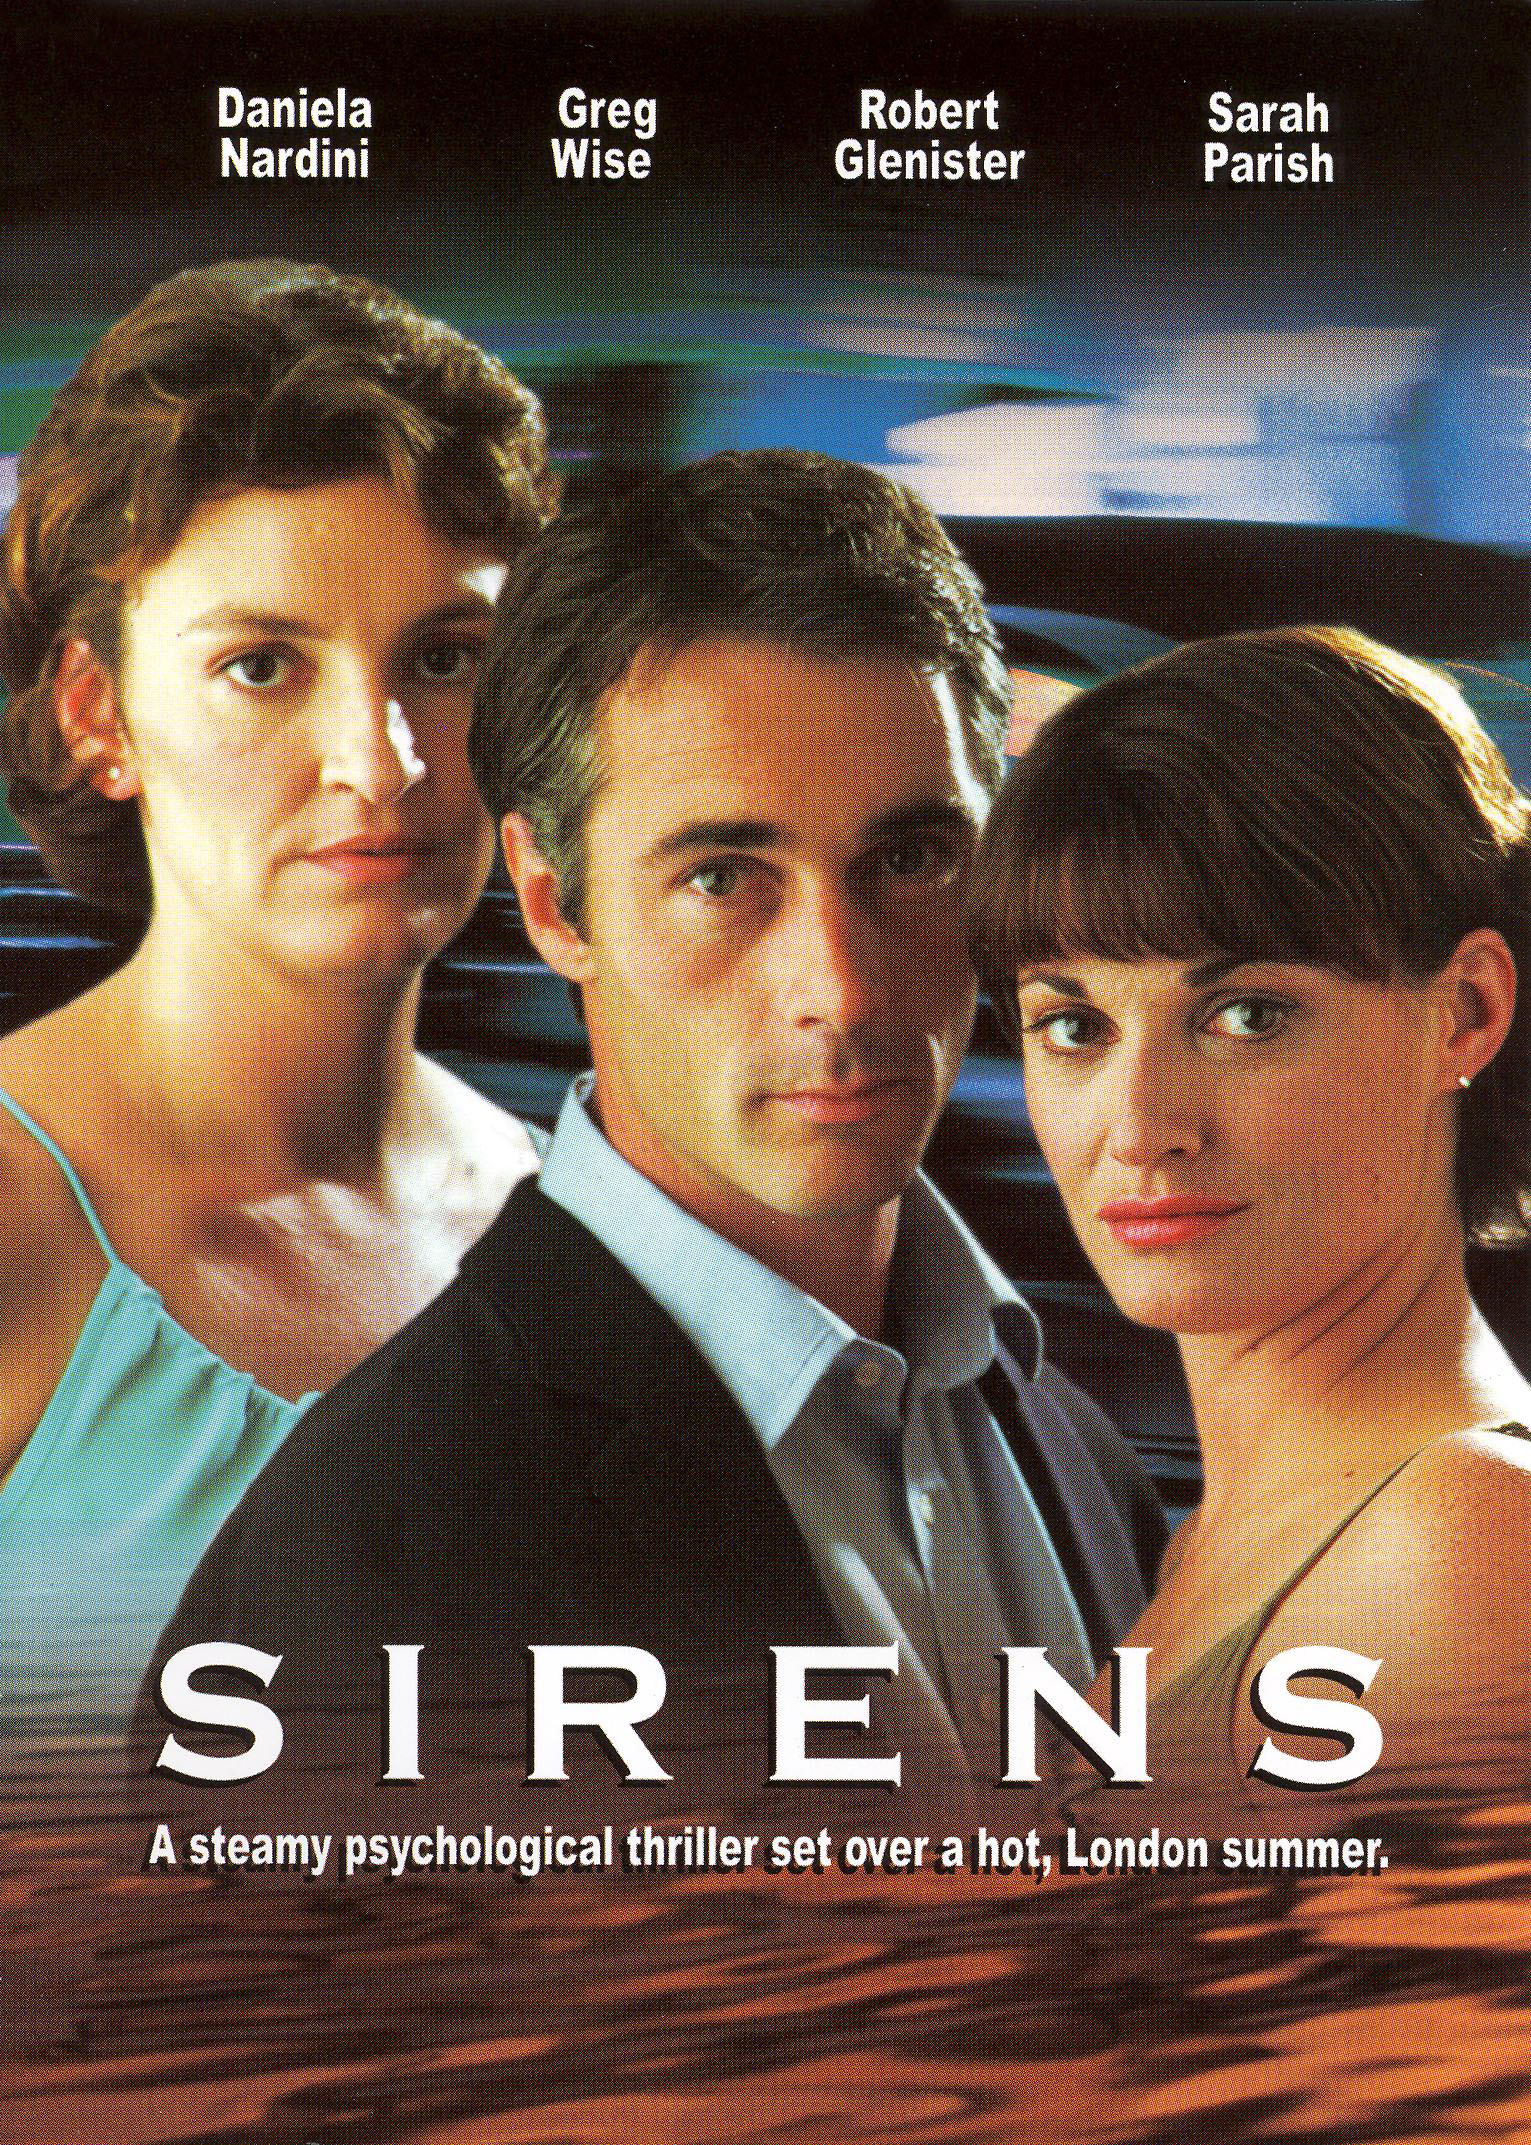 Sirens (2002) - Nicholas Laughland